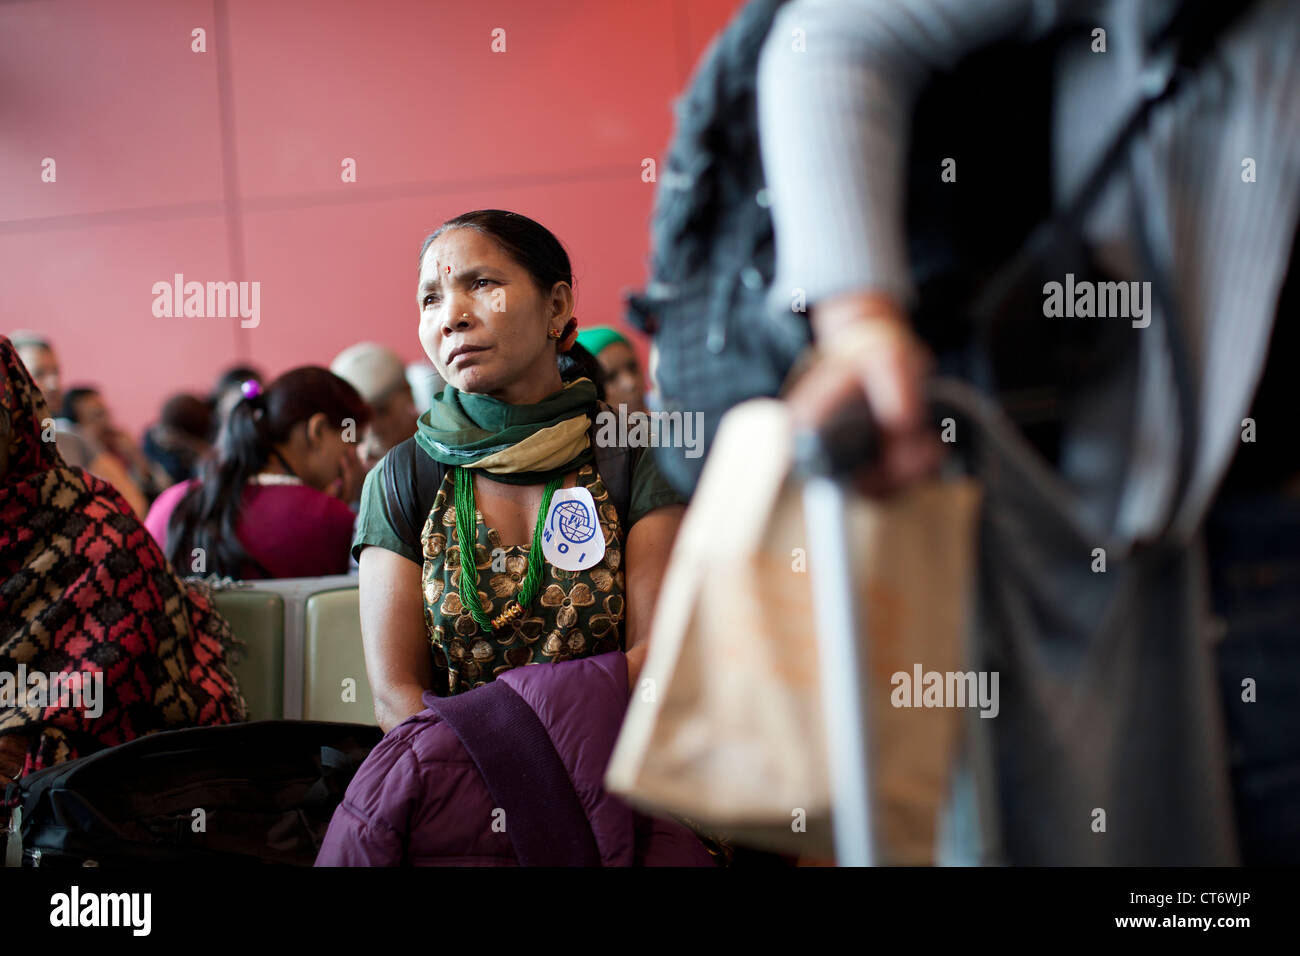 Bhutanese refugees of Nepali origin wait for an IOM sponsored flight to the U.S. at London, England's Heathrow Airport. Stock Photo